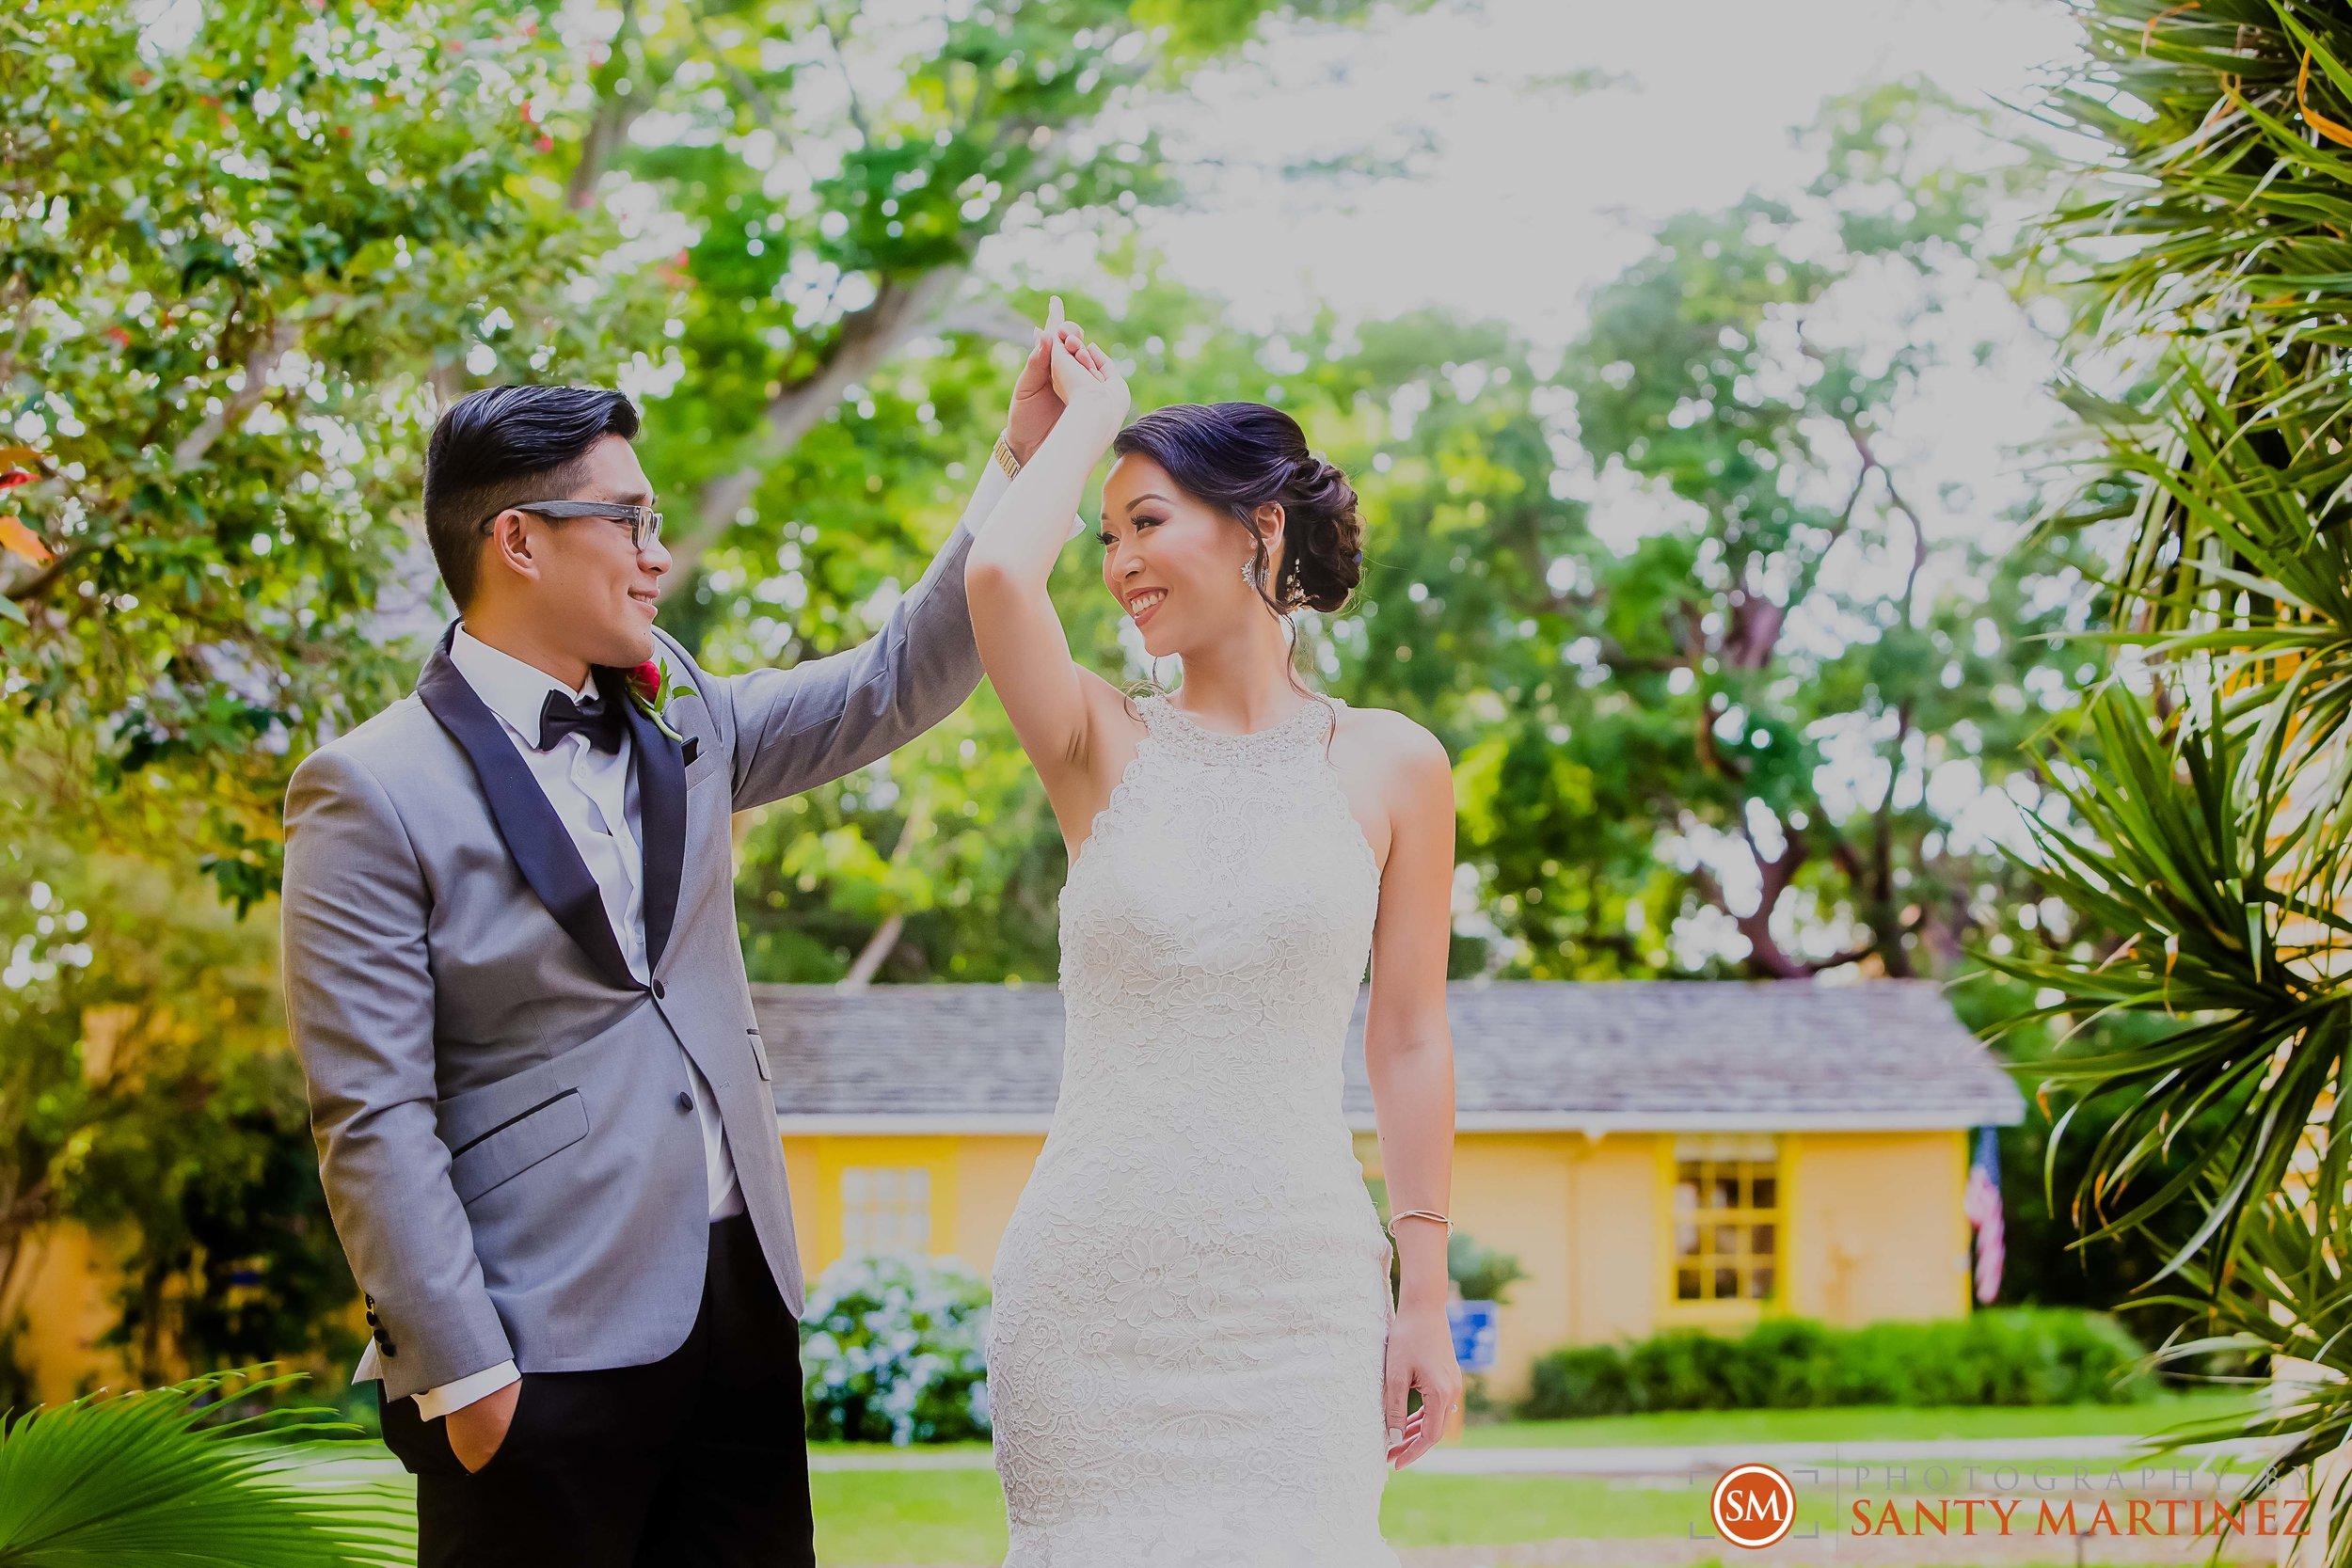 Wedding Bonnet House - Photography by Santy Martinez-16.jpg